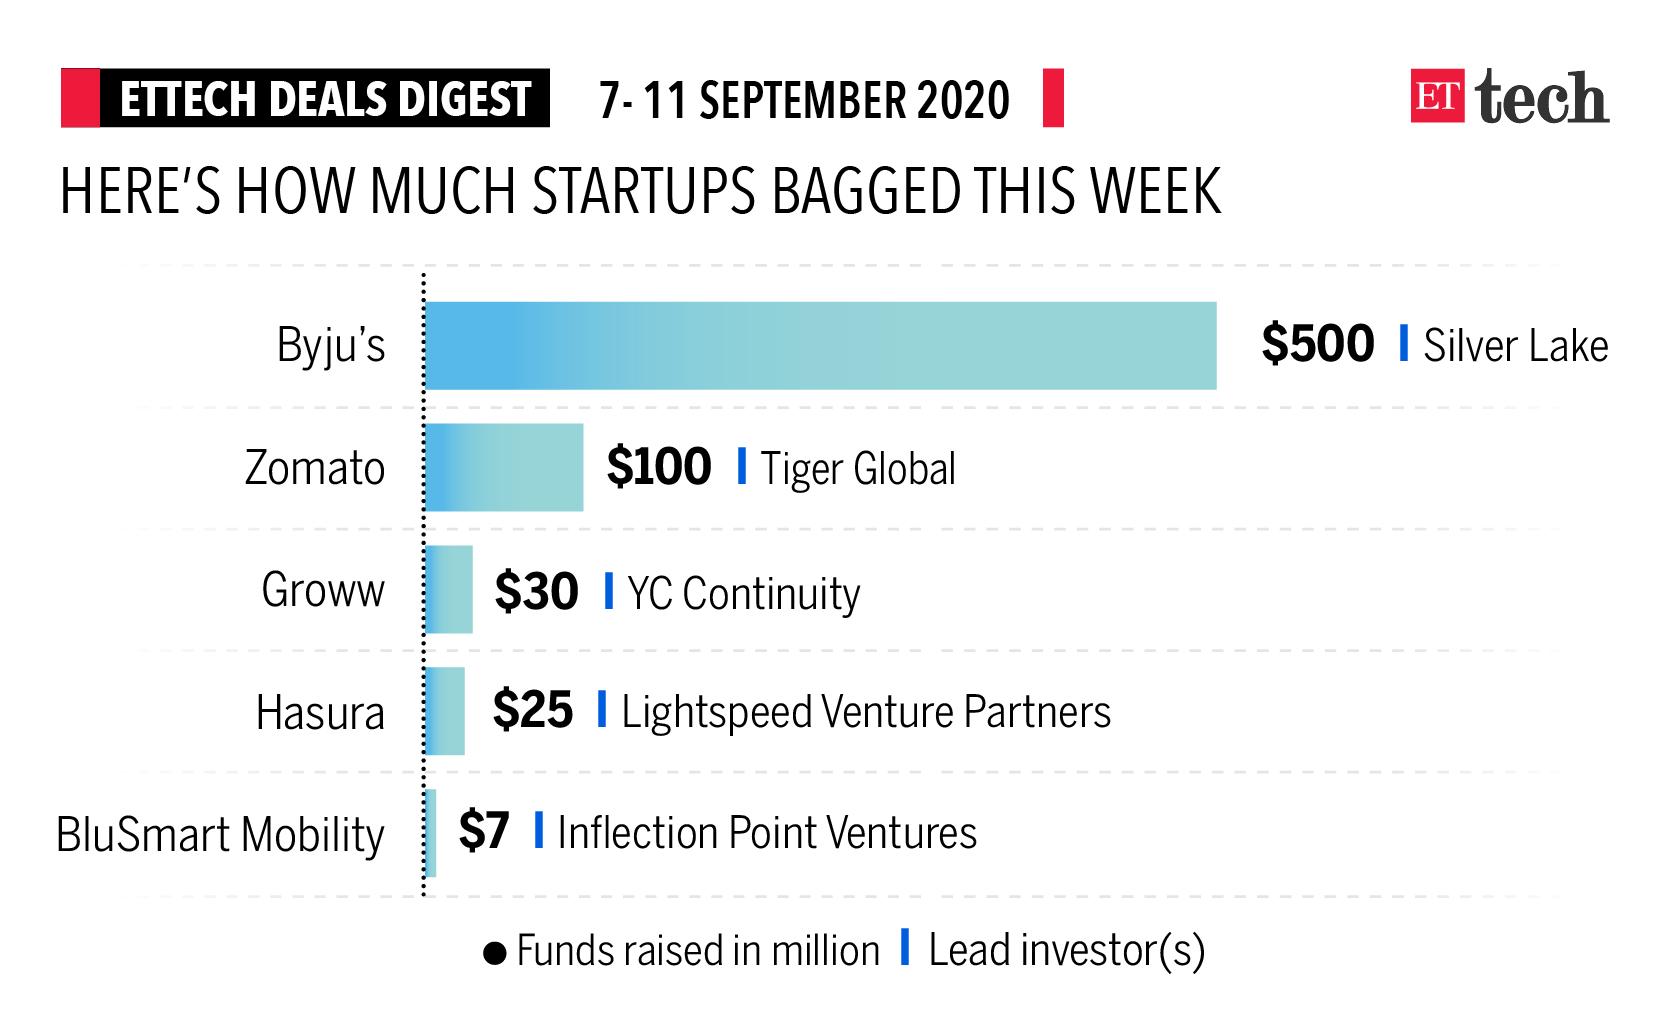 ETtech Deals Digest: Byju's, Zomato, Groww raise funds this week